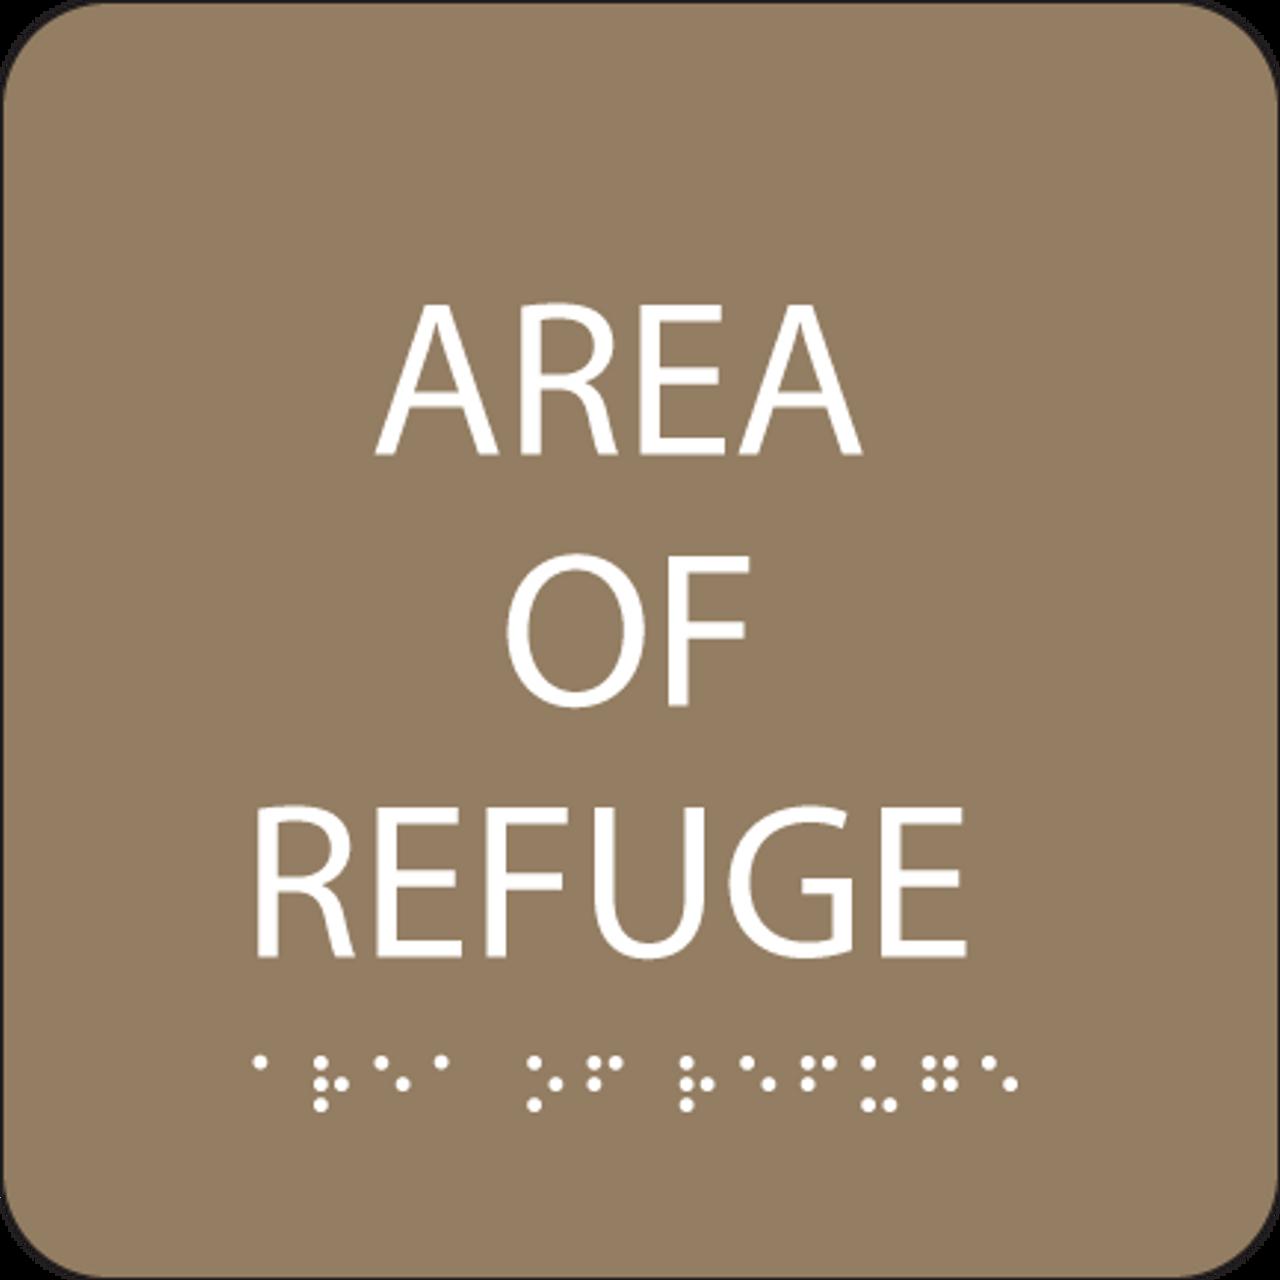 Brown Area of Refuge Braille Sign